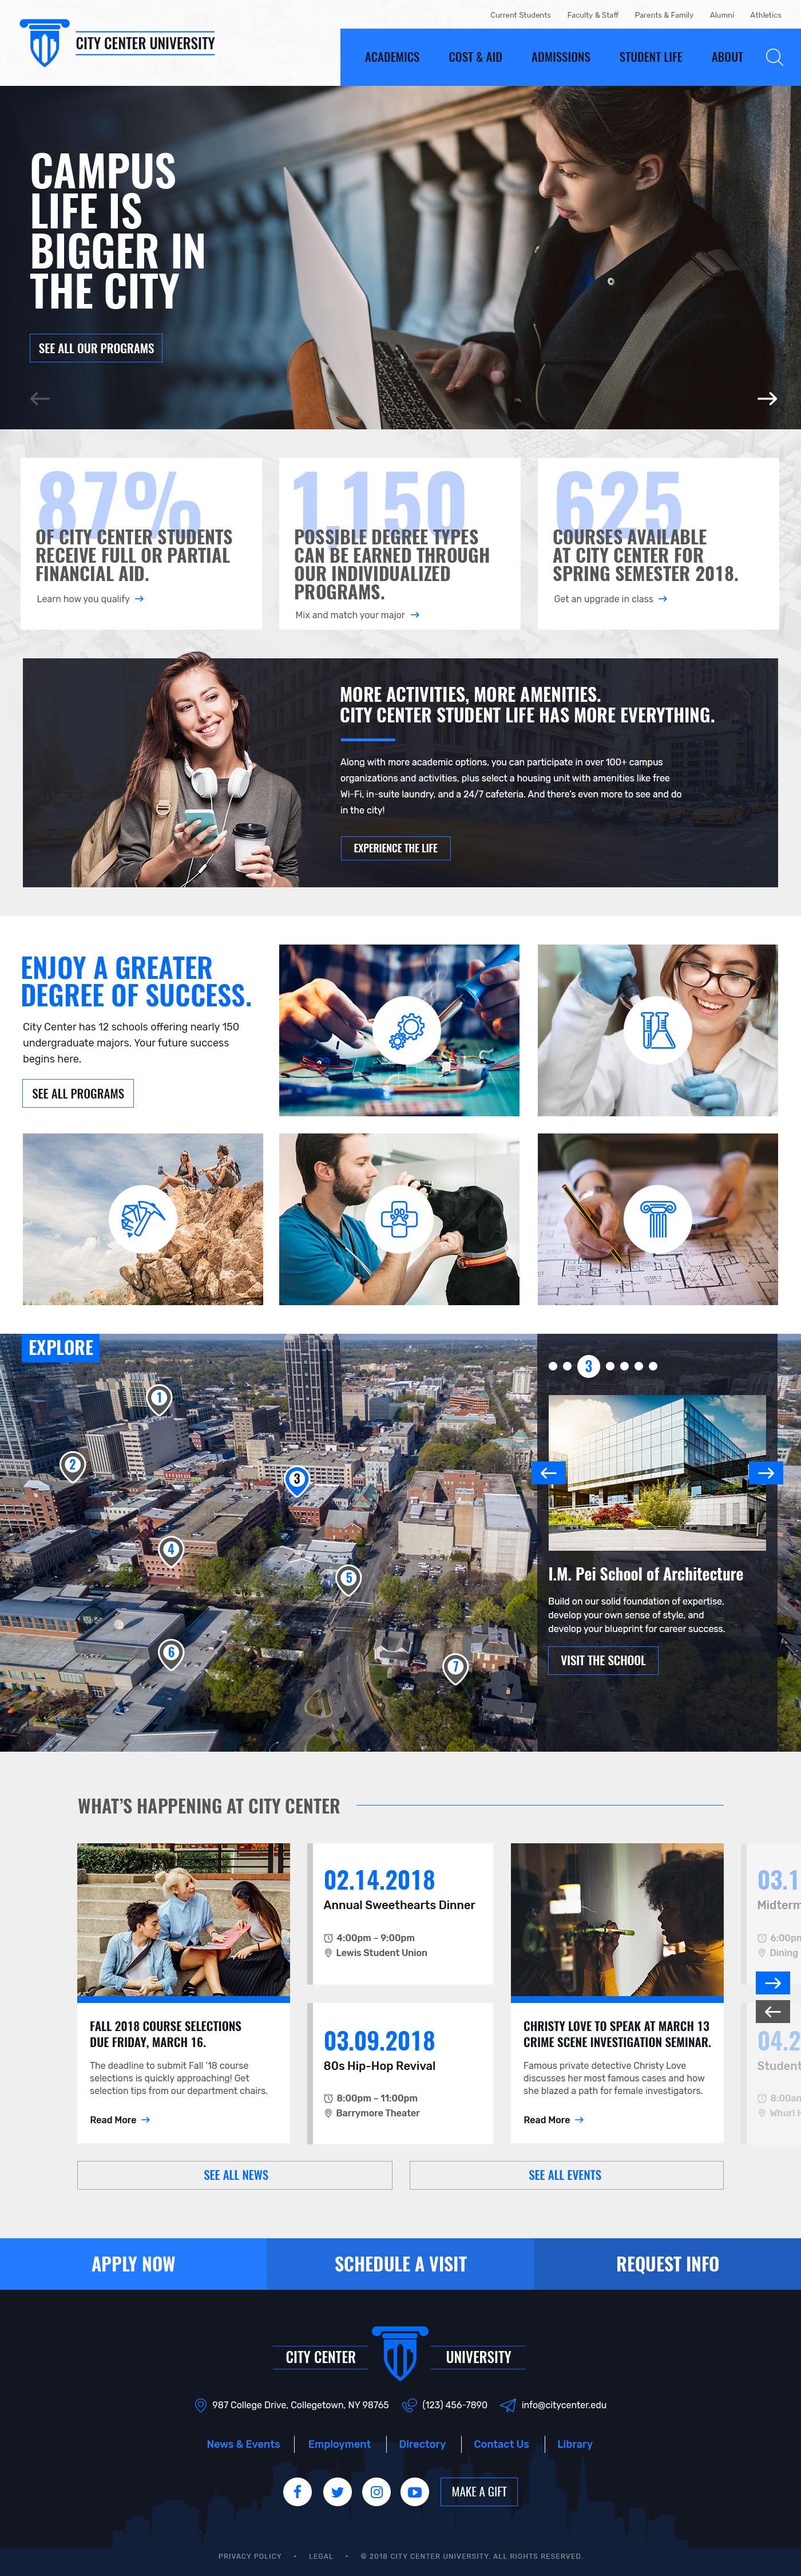 City Center University Theme Homepage Desktop Preview